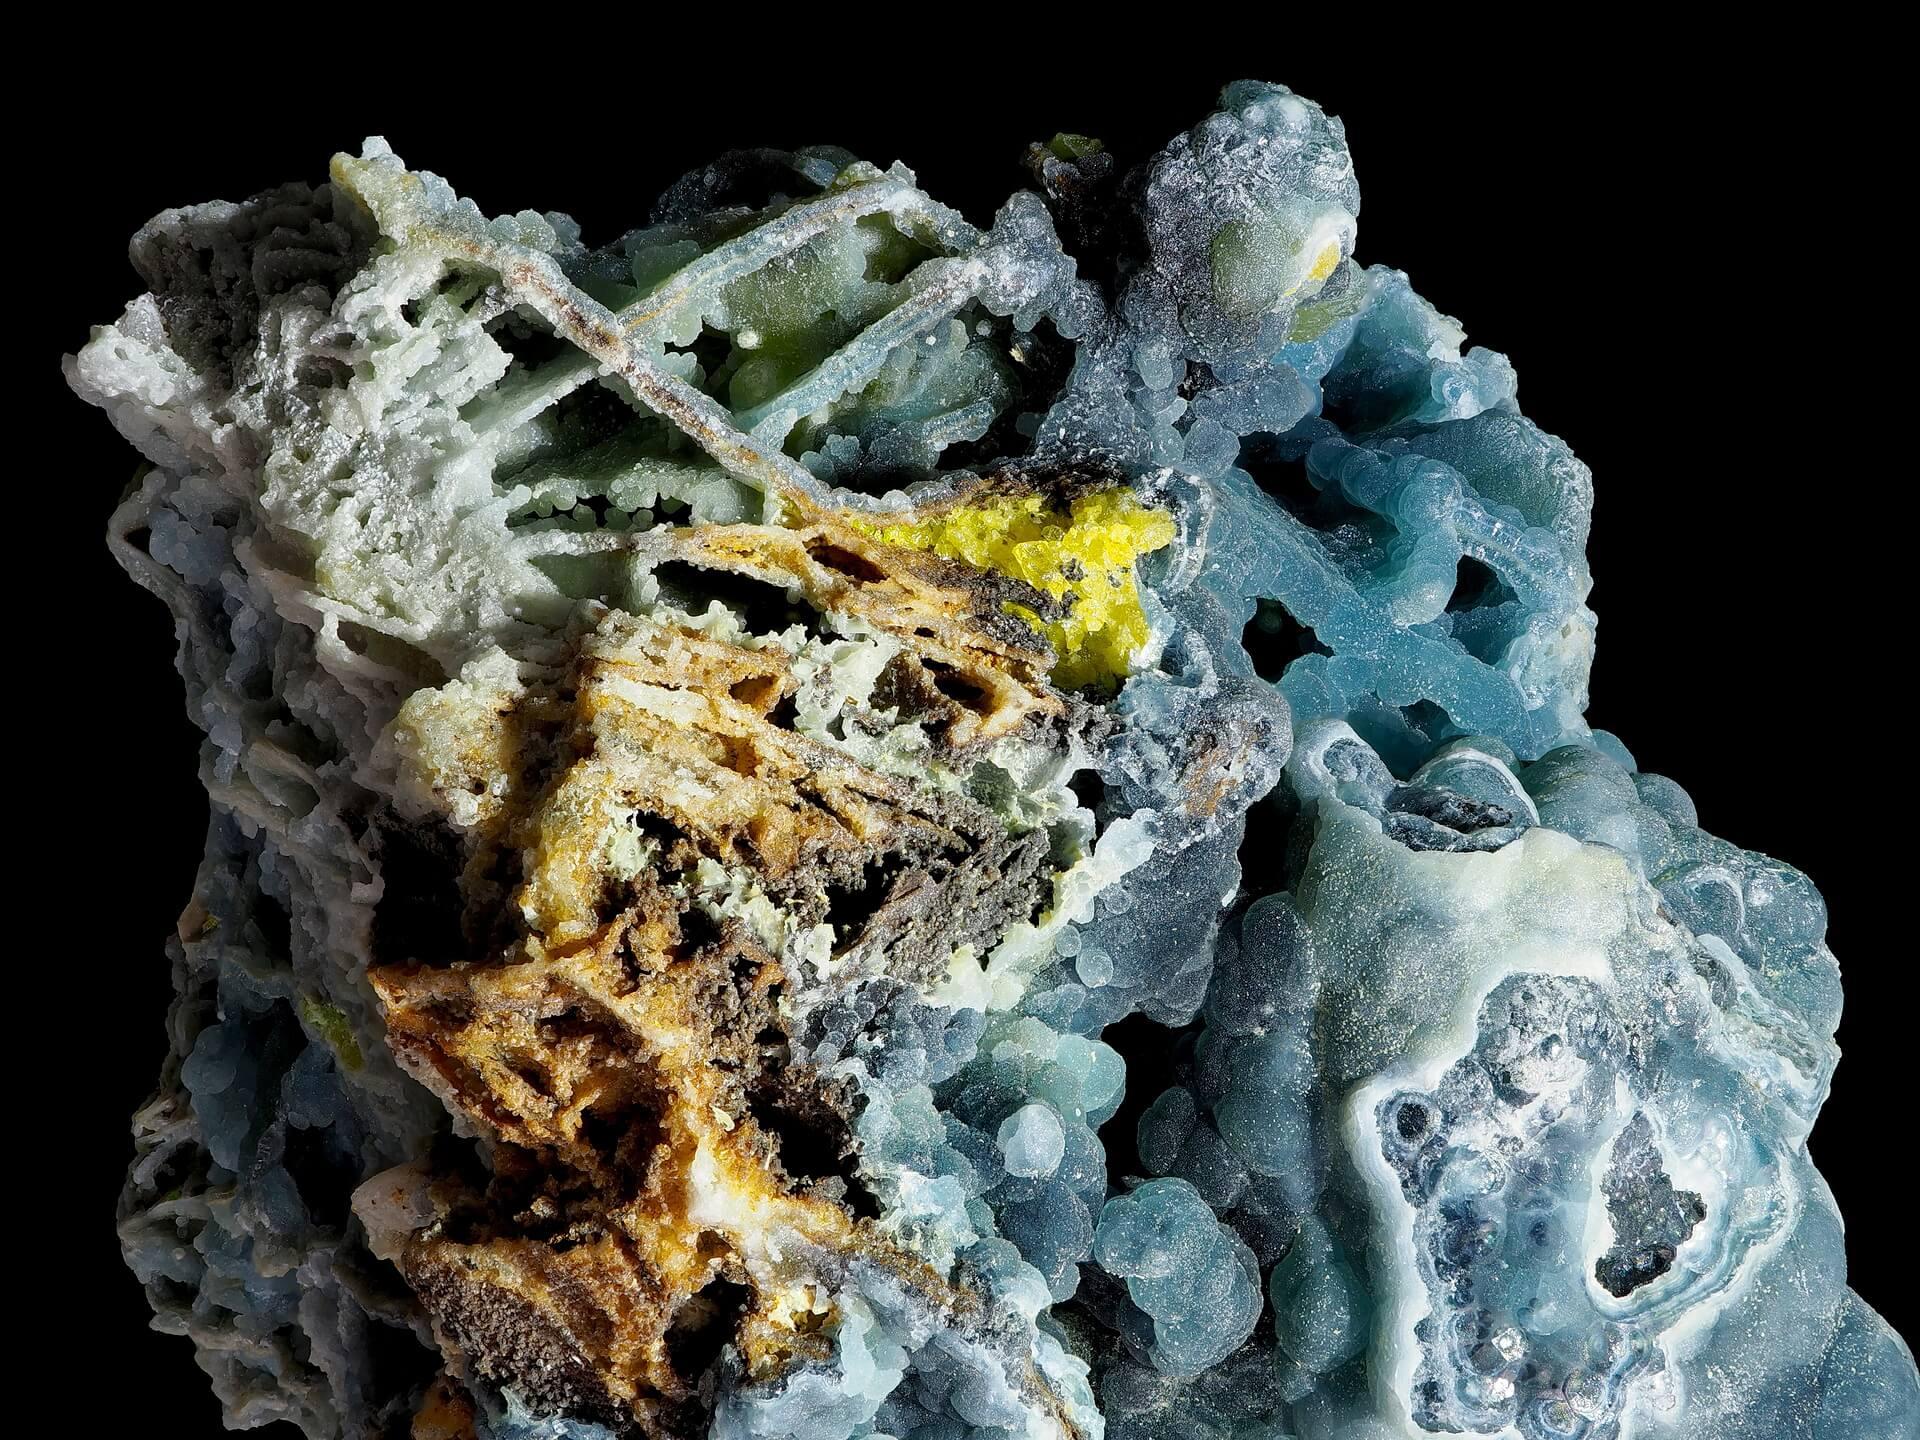 Criss-cross pattern of blue Plumbogummite on Quartz.